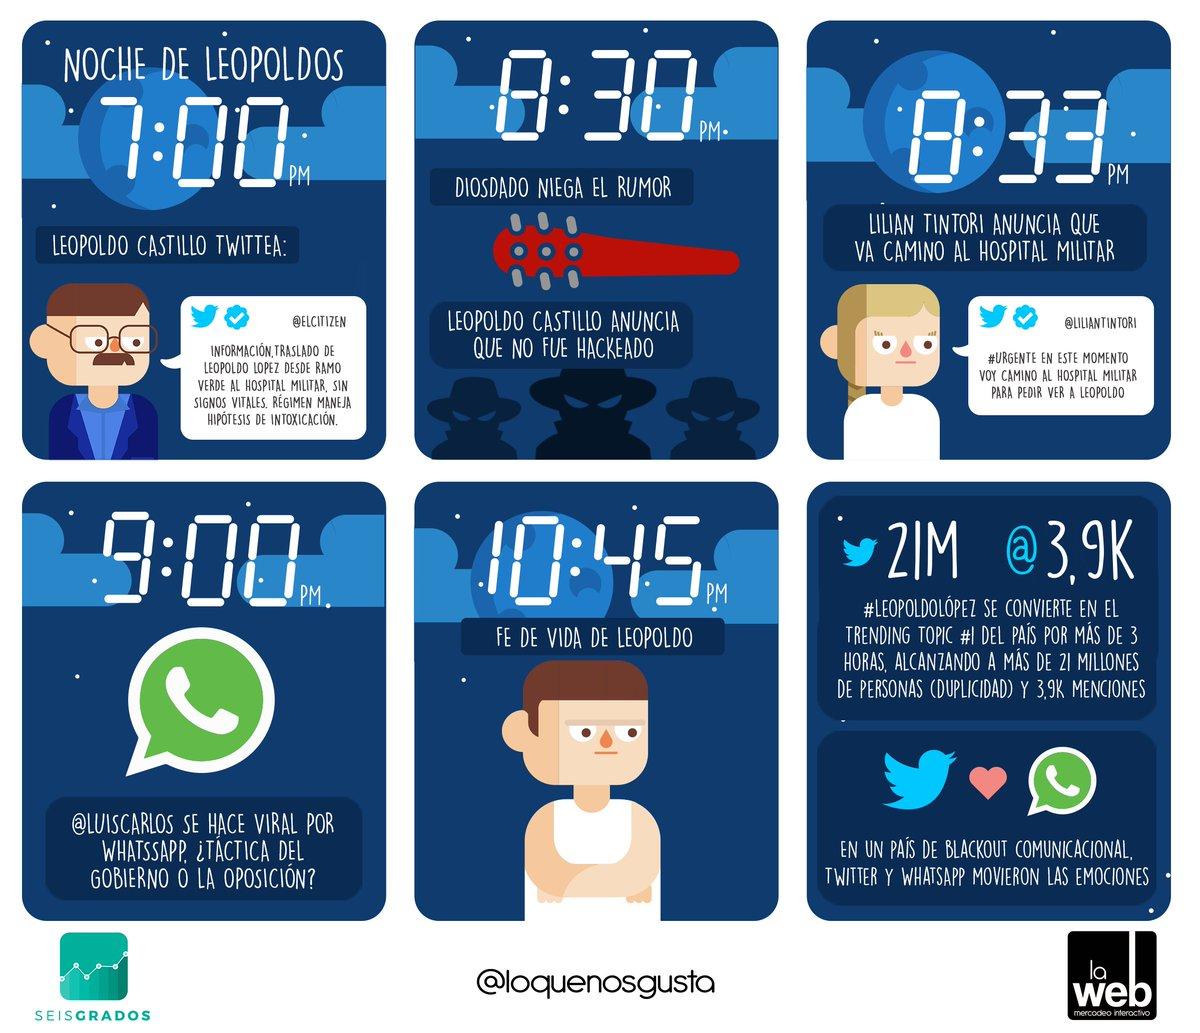 En un país de blackout comunicacional, Twitter y WhatsApp movieron las emociones. https://t.co/B8TXAI8d7l